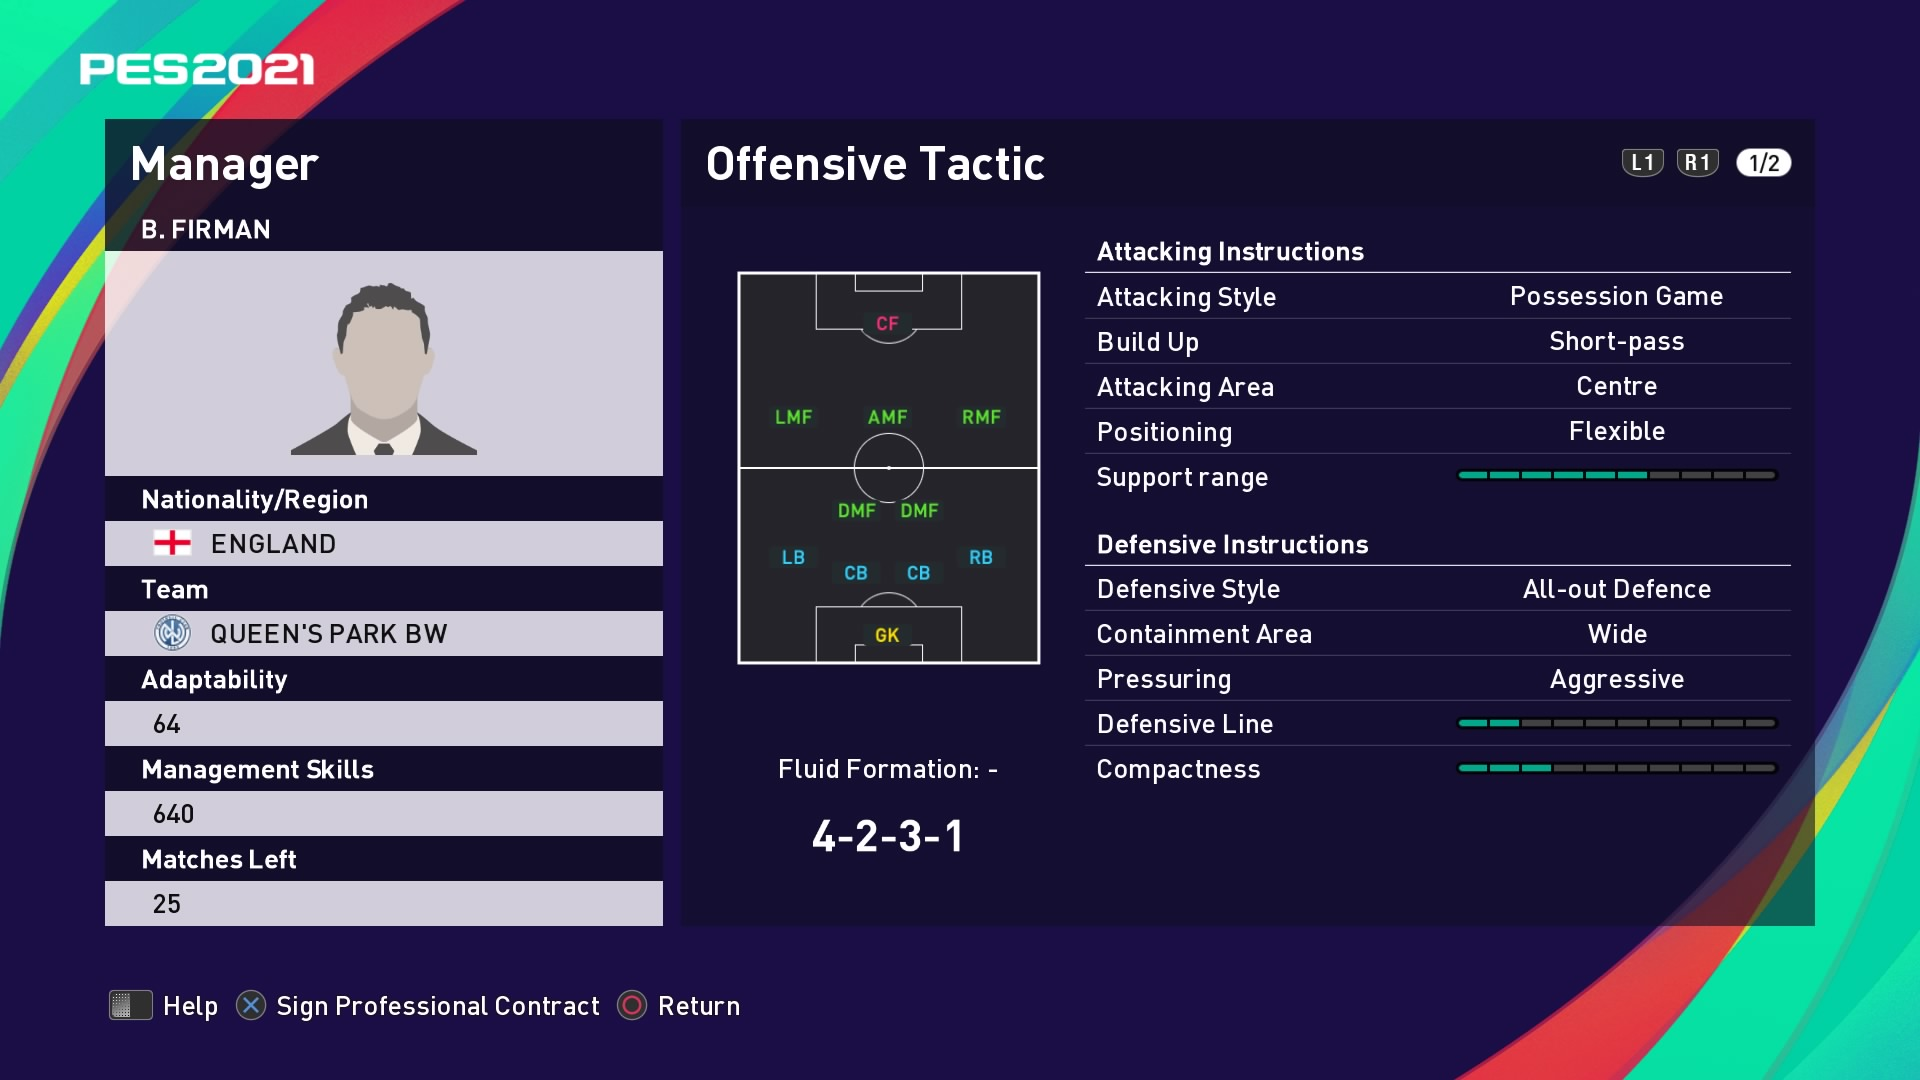 B. Firman (Mark Warburton) Offensive Tactic in PES 2021 myClub